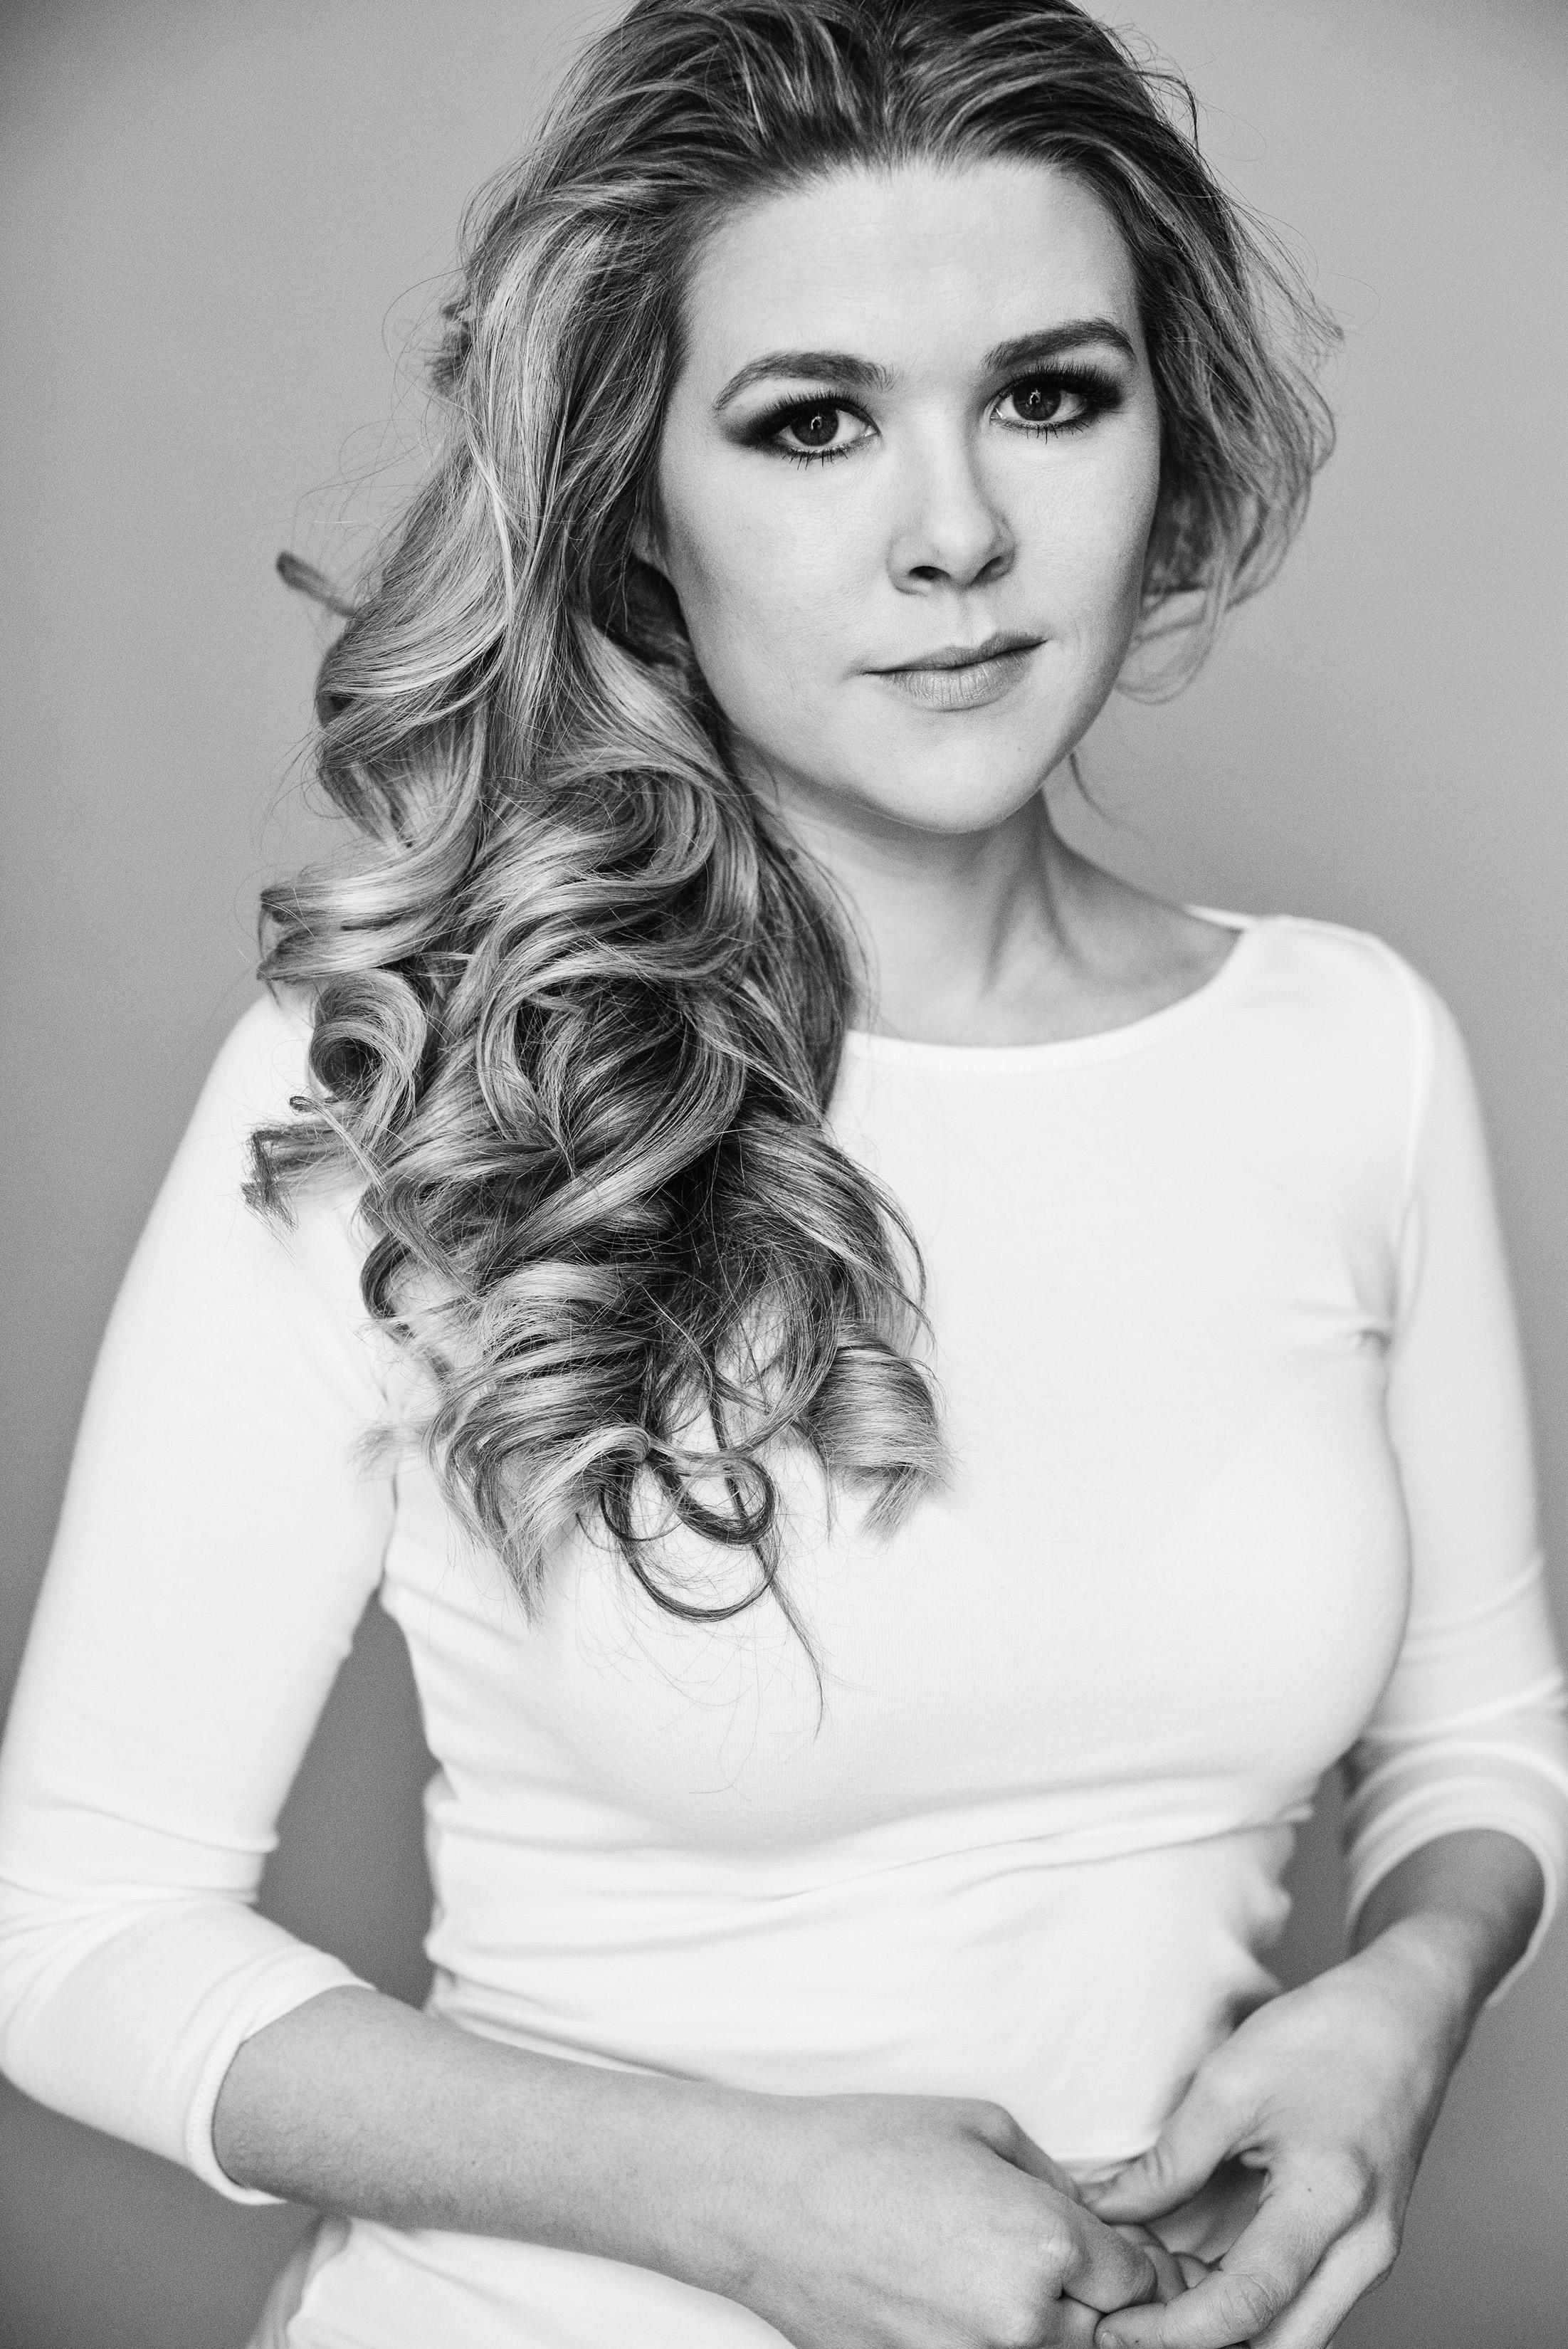 Lucy-Jane Quinlan - IMDb